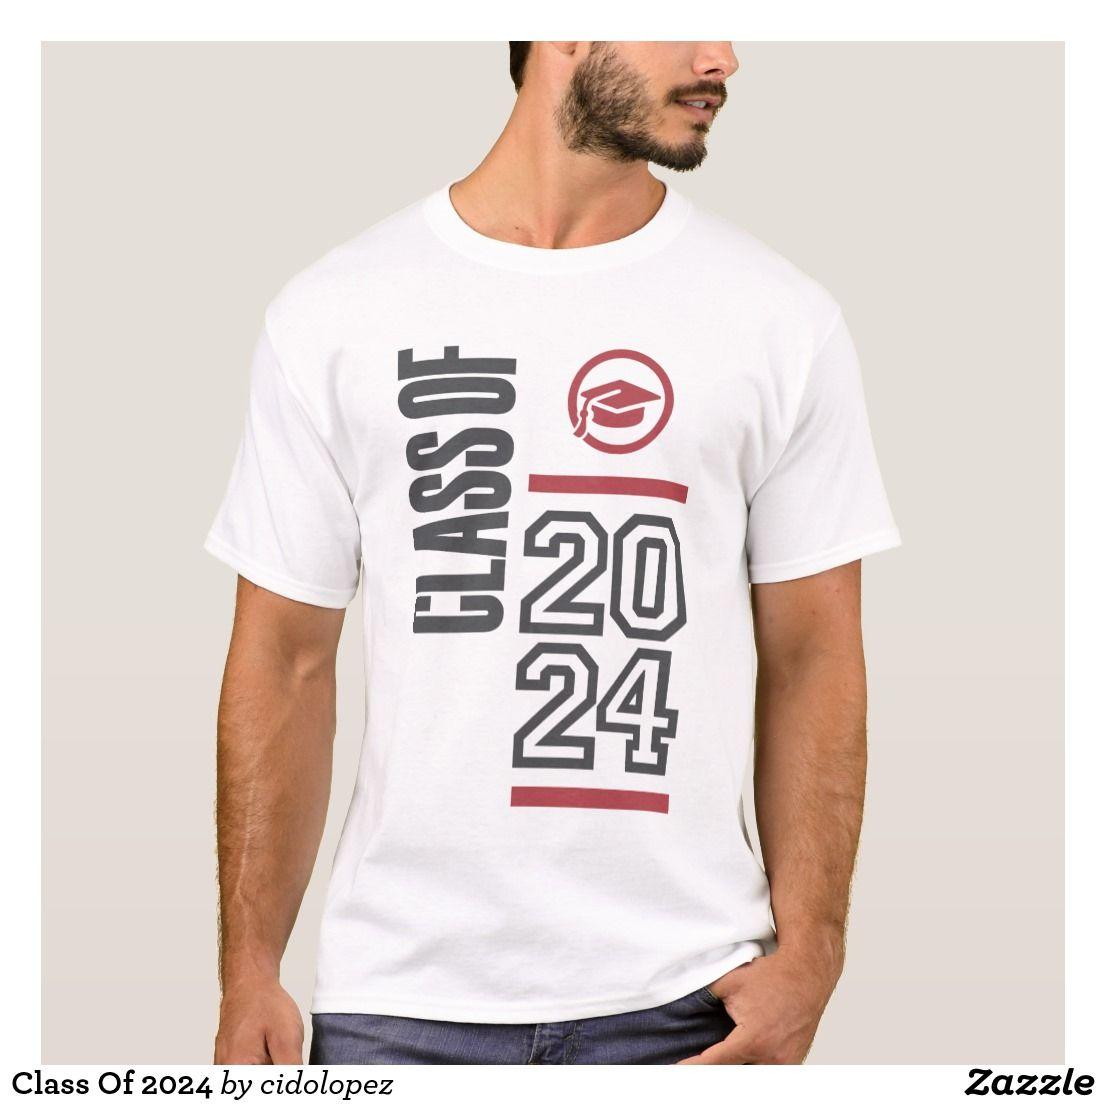 Class of 2024 tshirt t shirt school